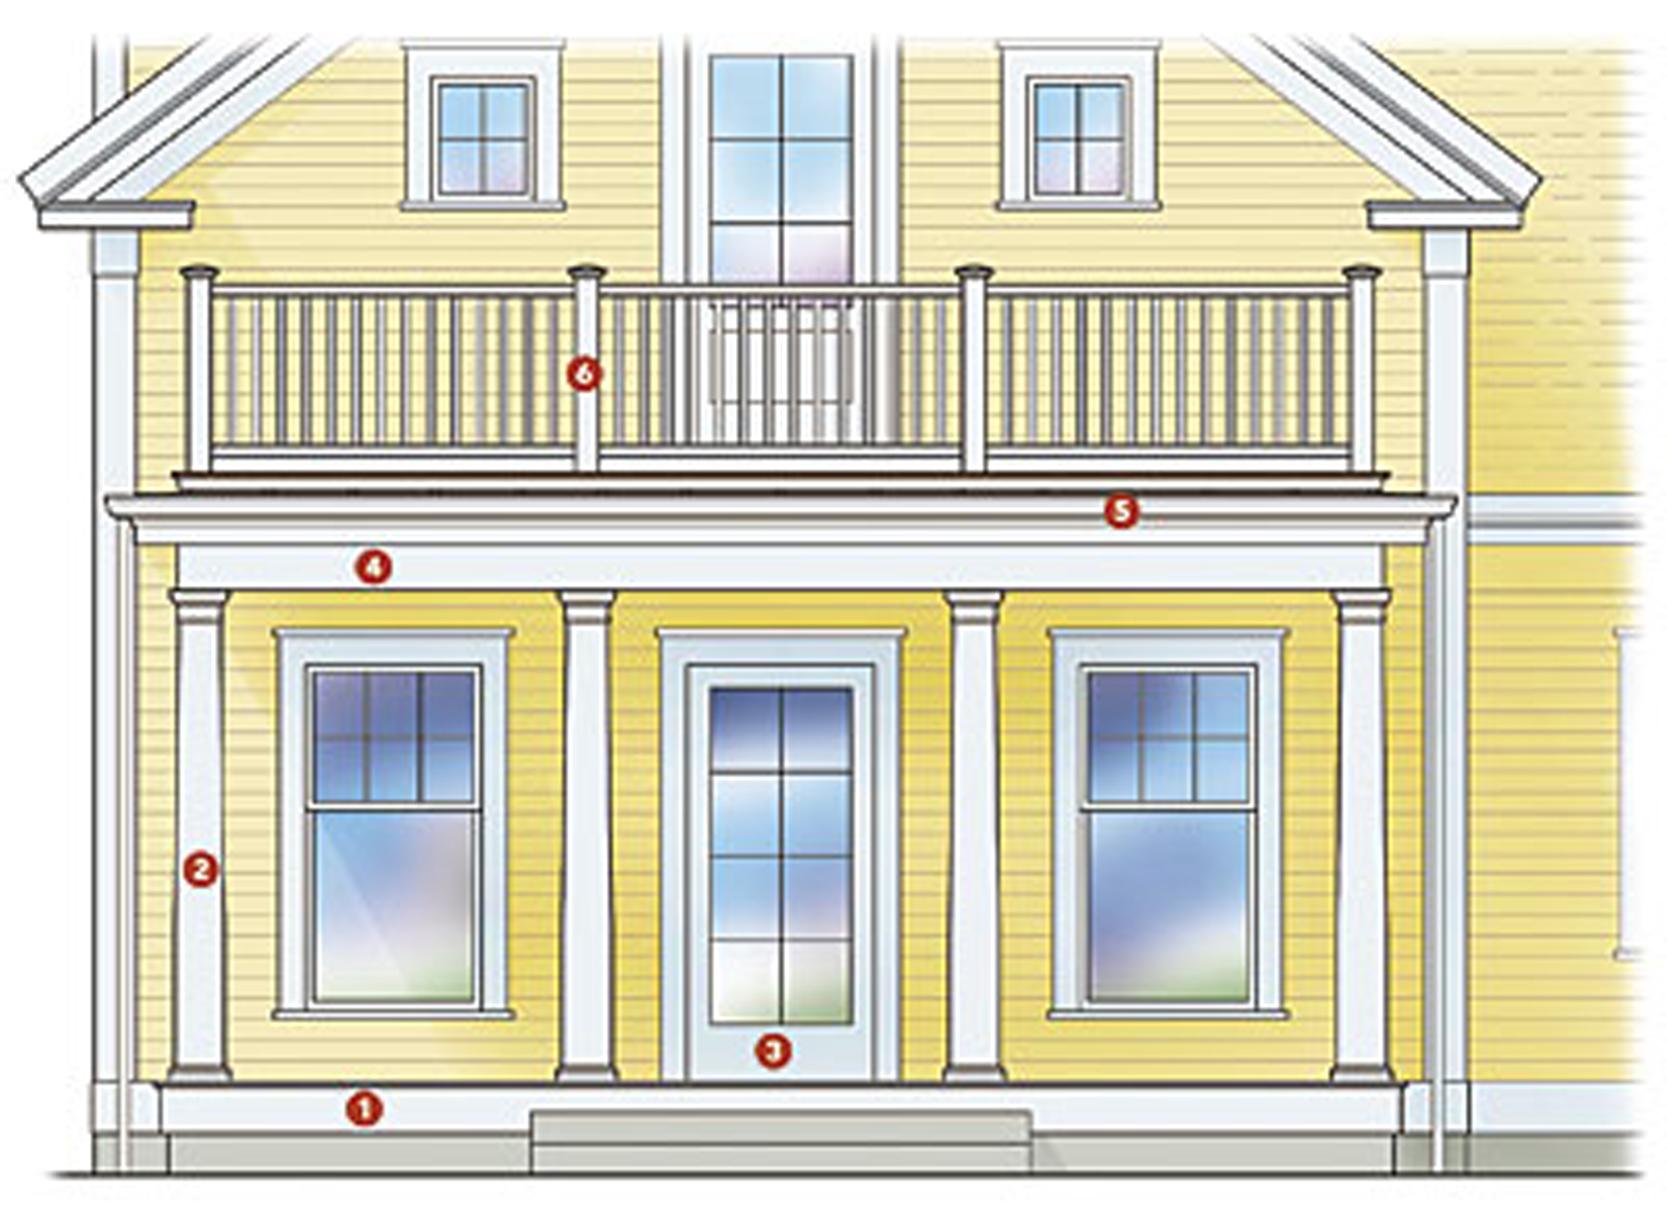 deck over porch image.jpg